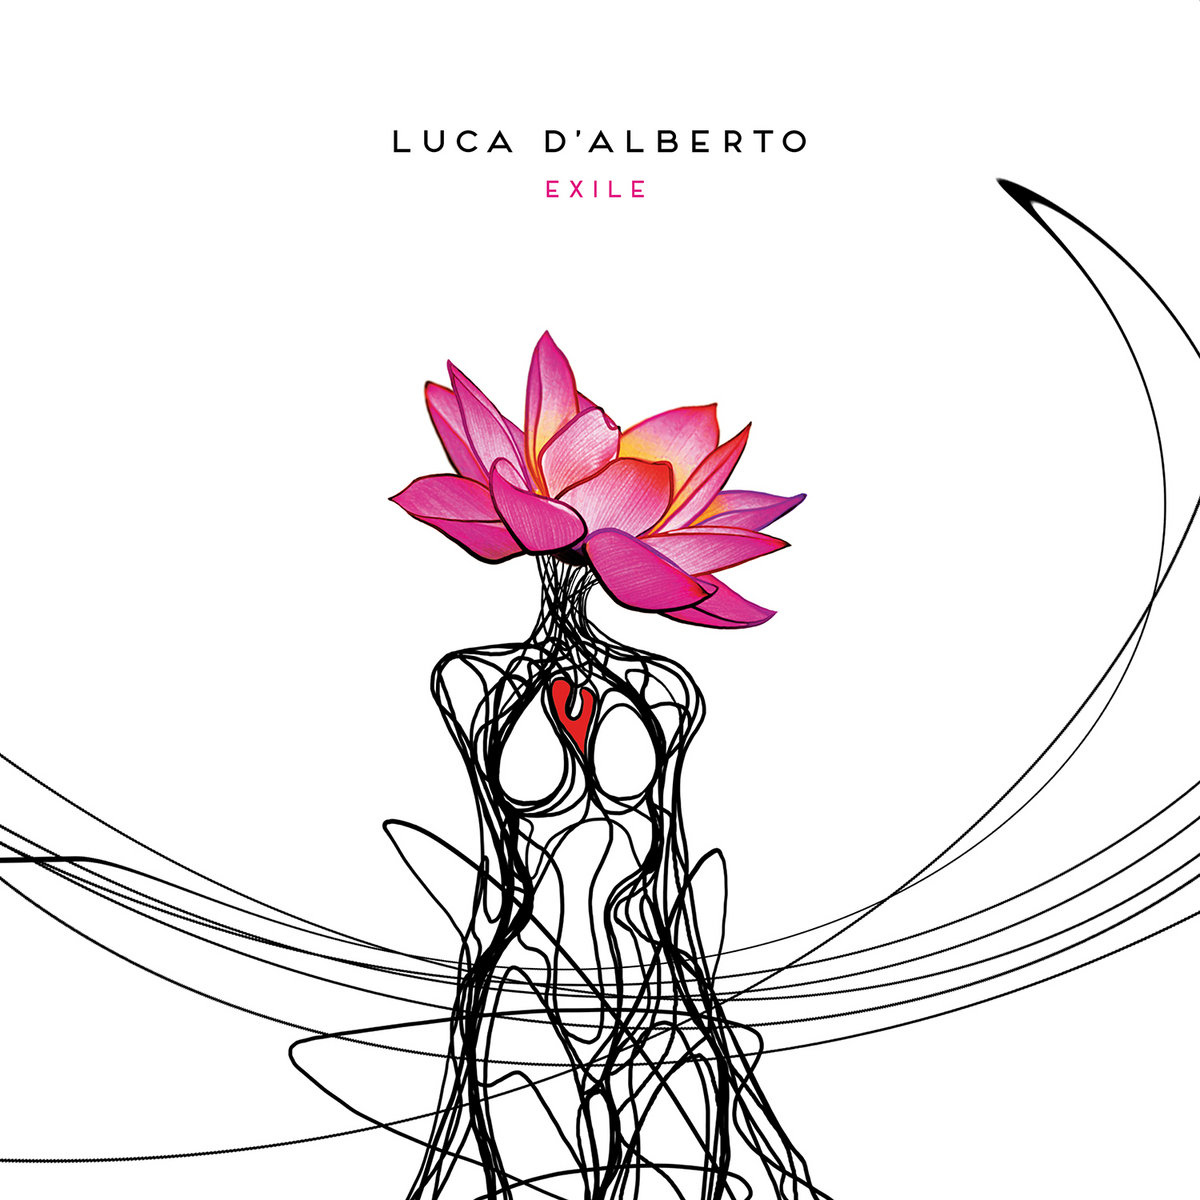 Exile Luca Dalberto